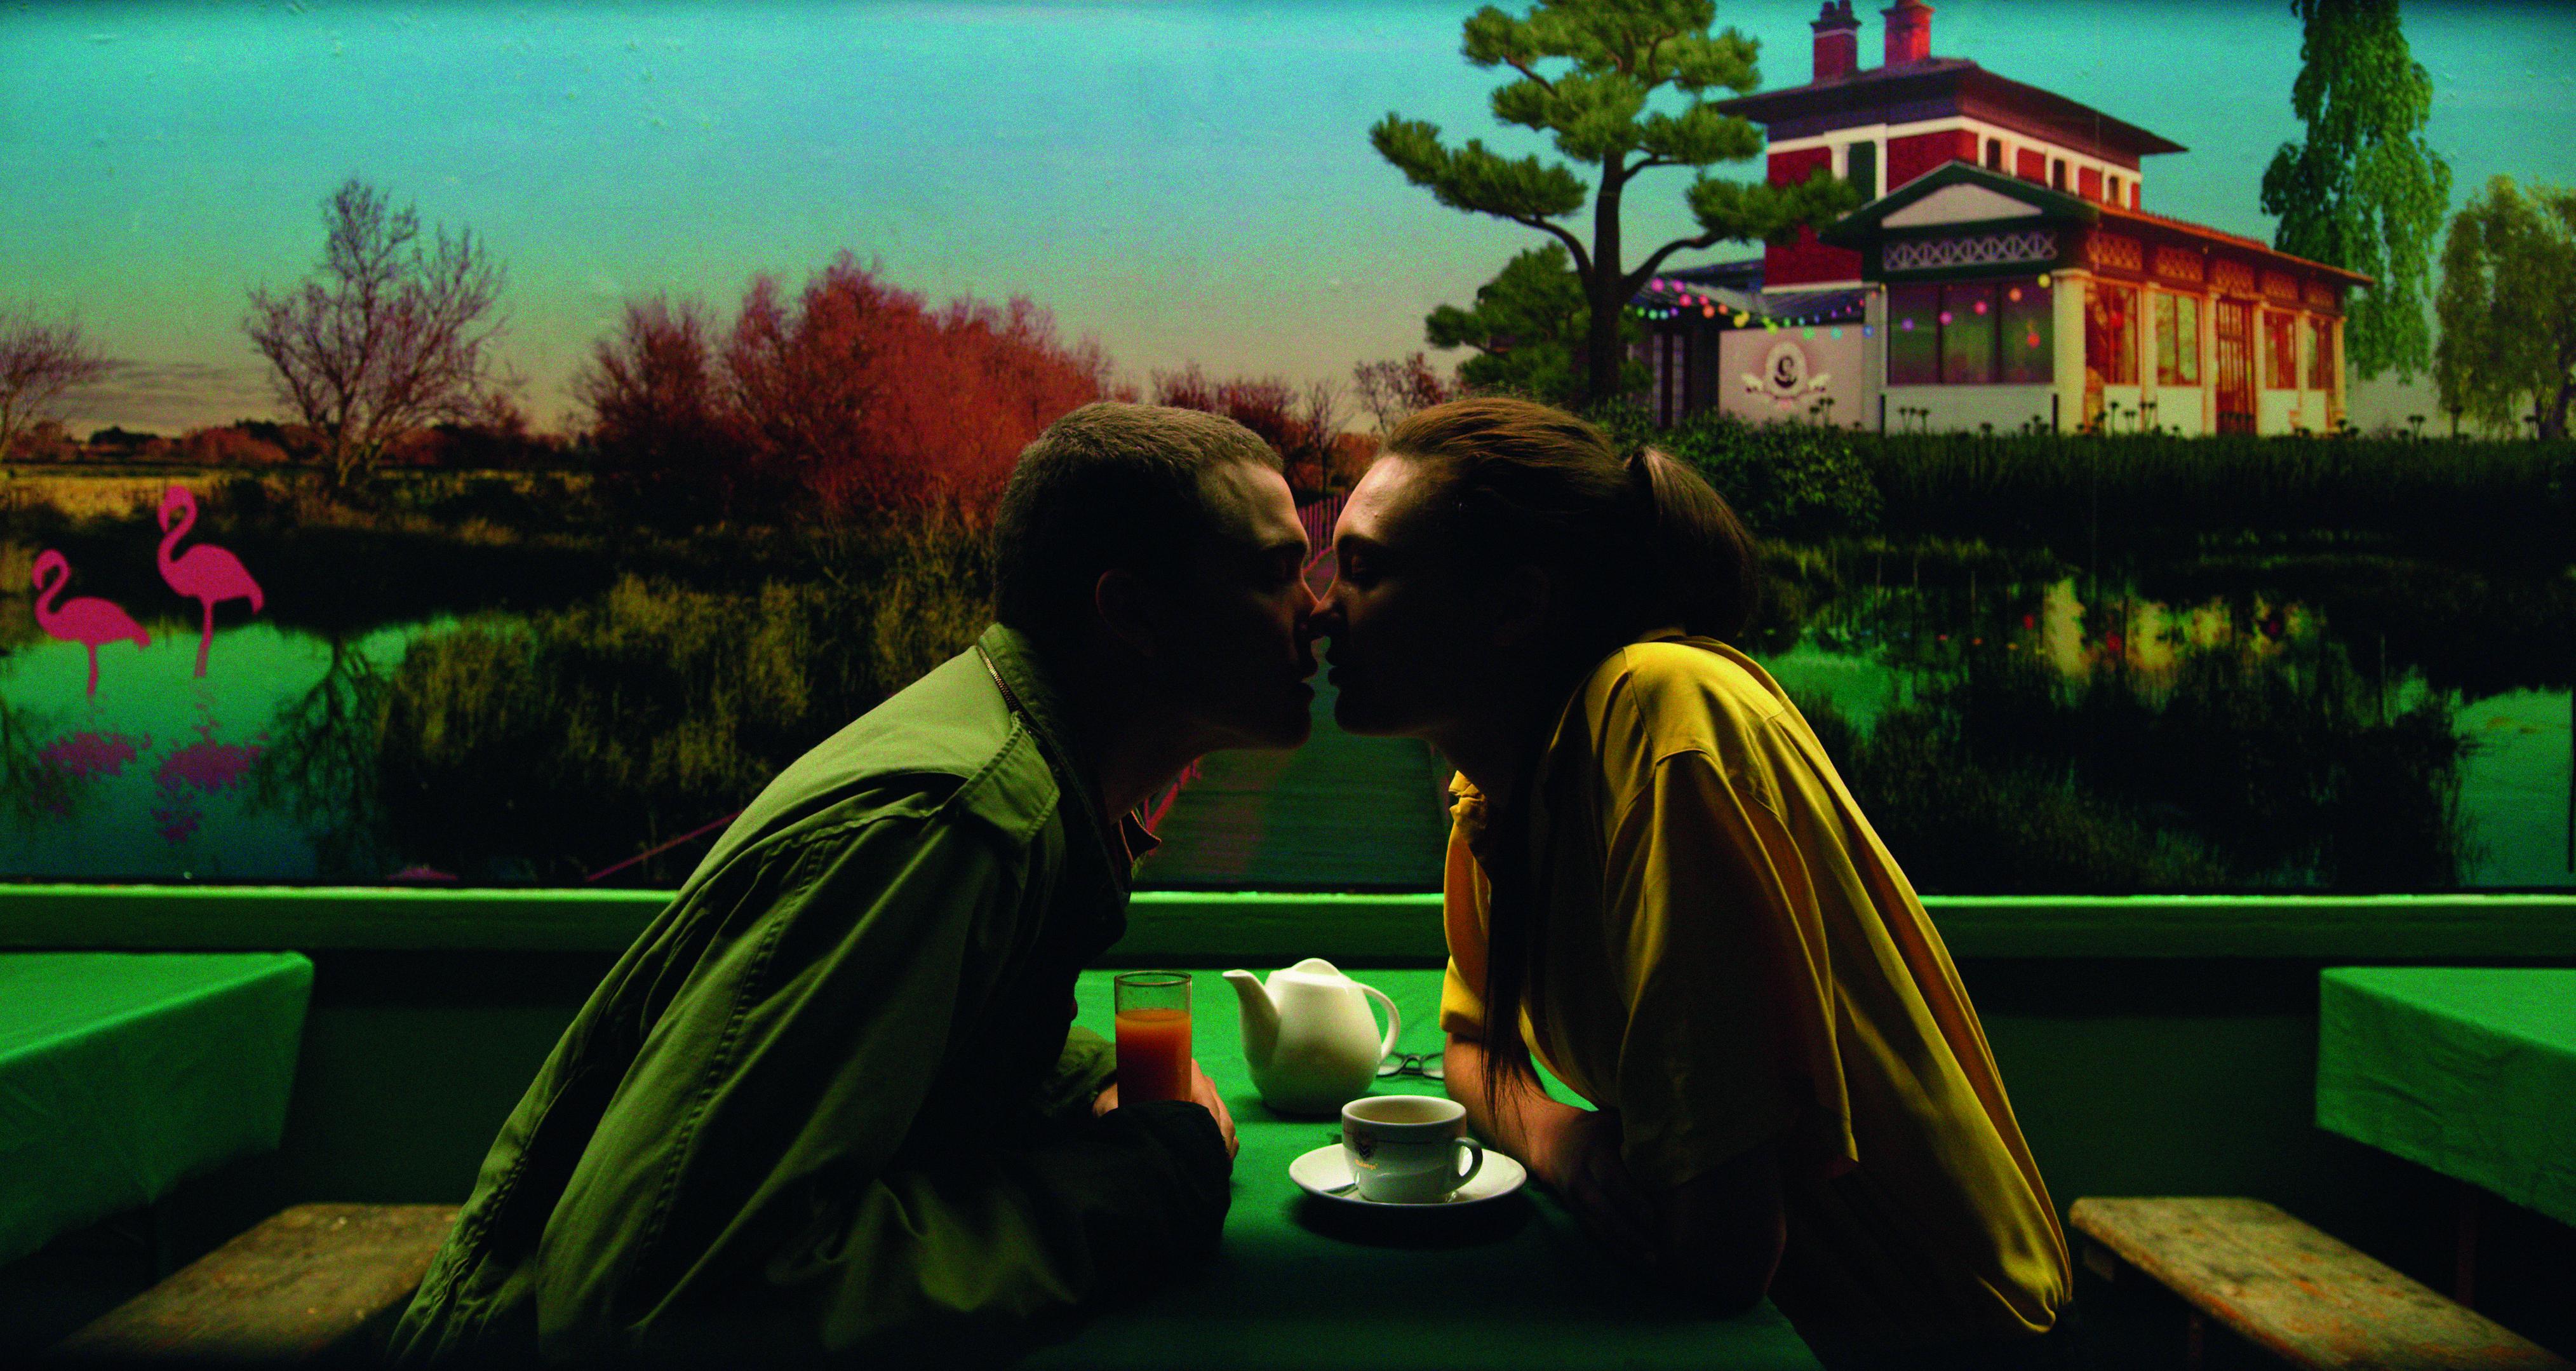 Karl Glusman as Murphy and Aomi Muyock as Electra in Alchemy's LOVE.